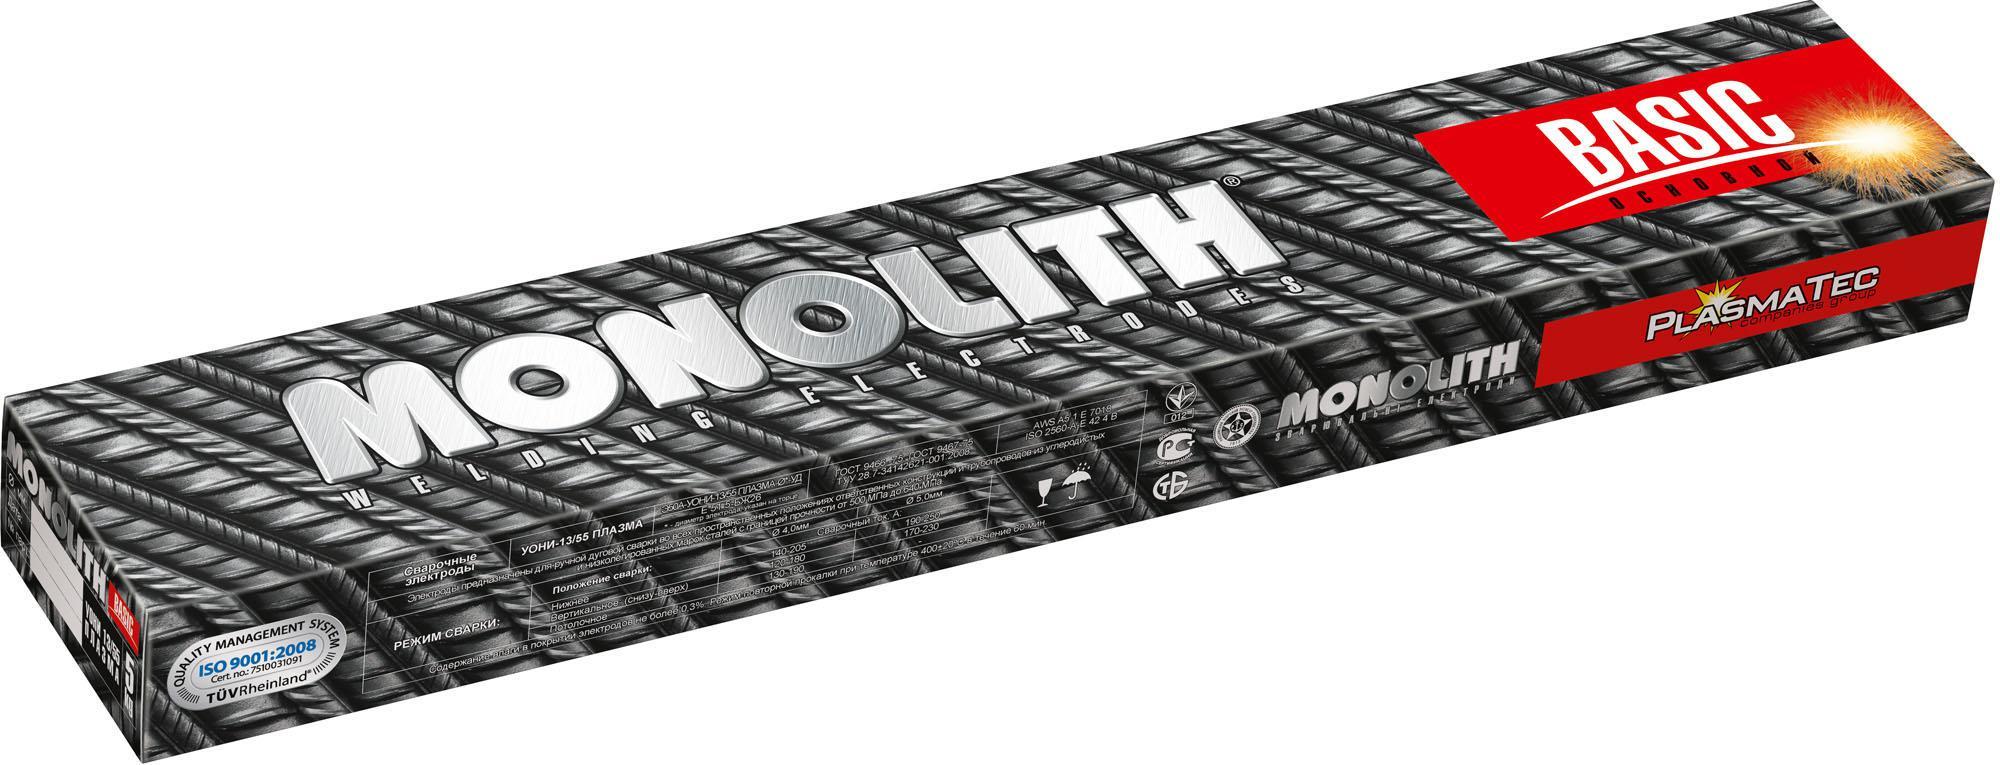 Электроды Monolith УОНИ-13/55 Д 3 мм уп 2.5кг